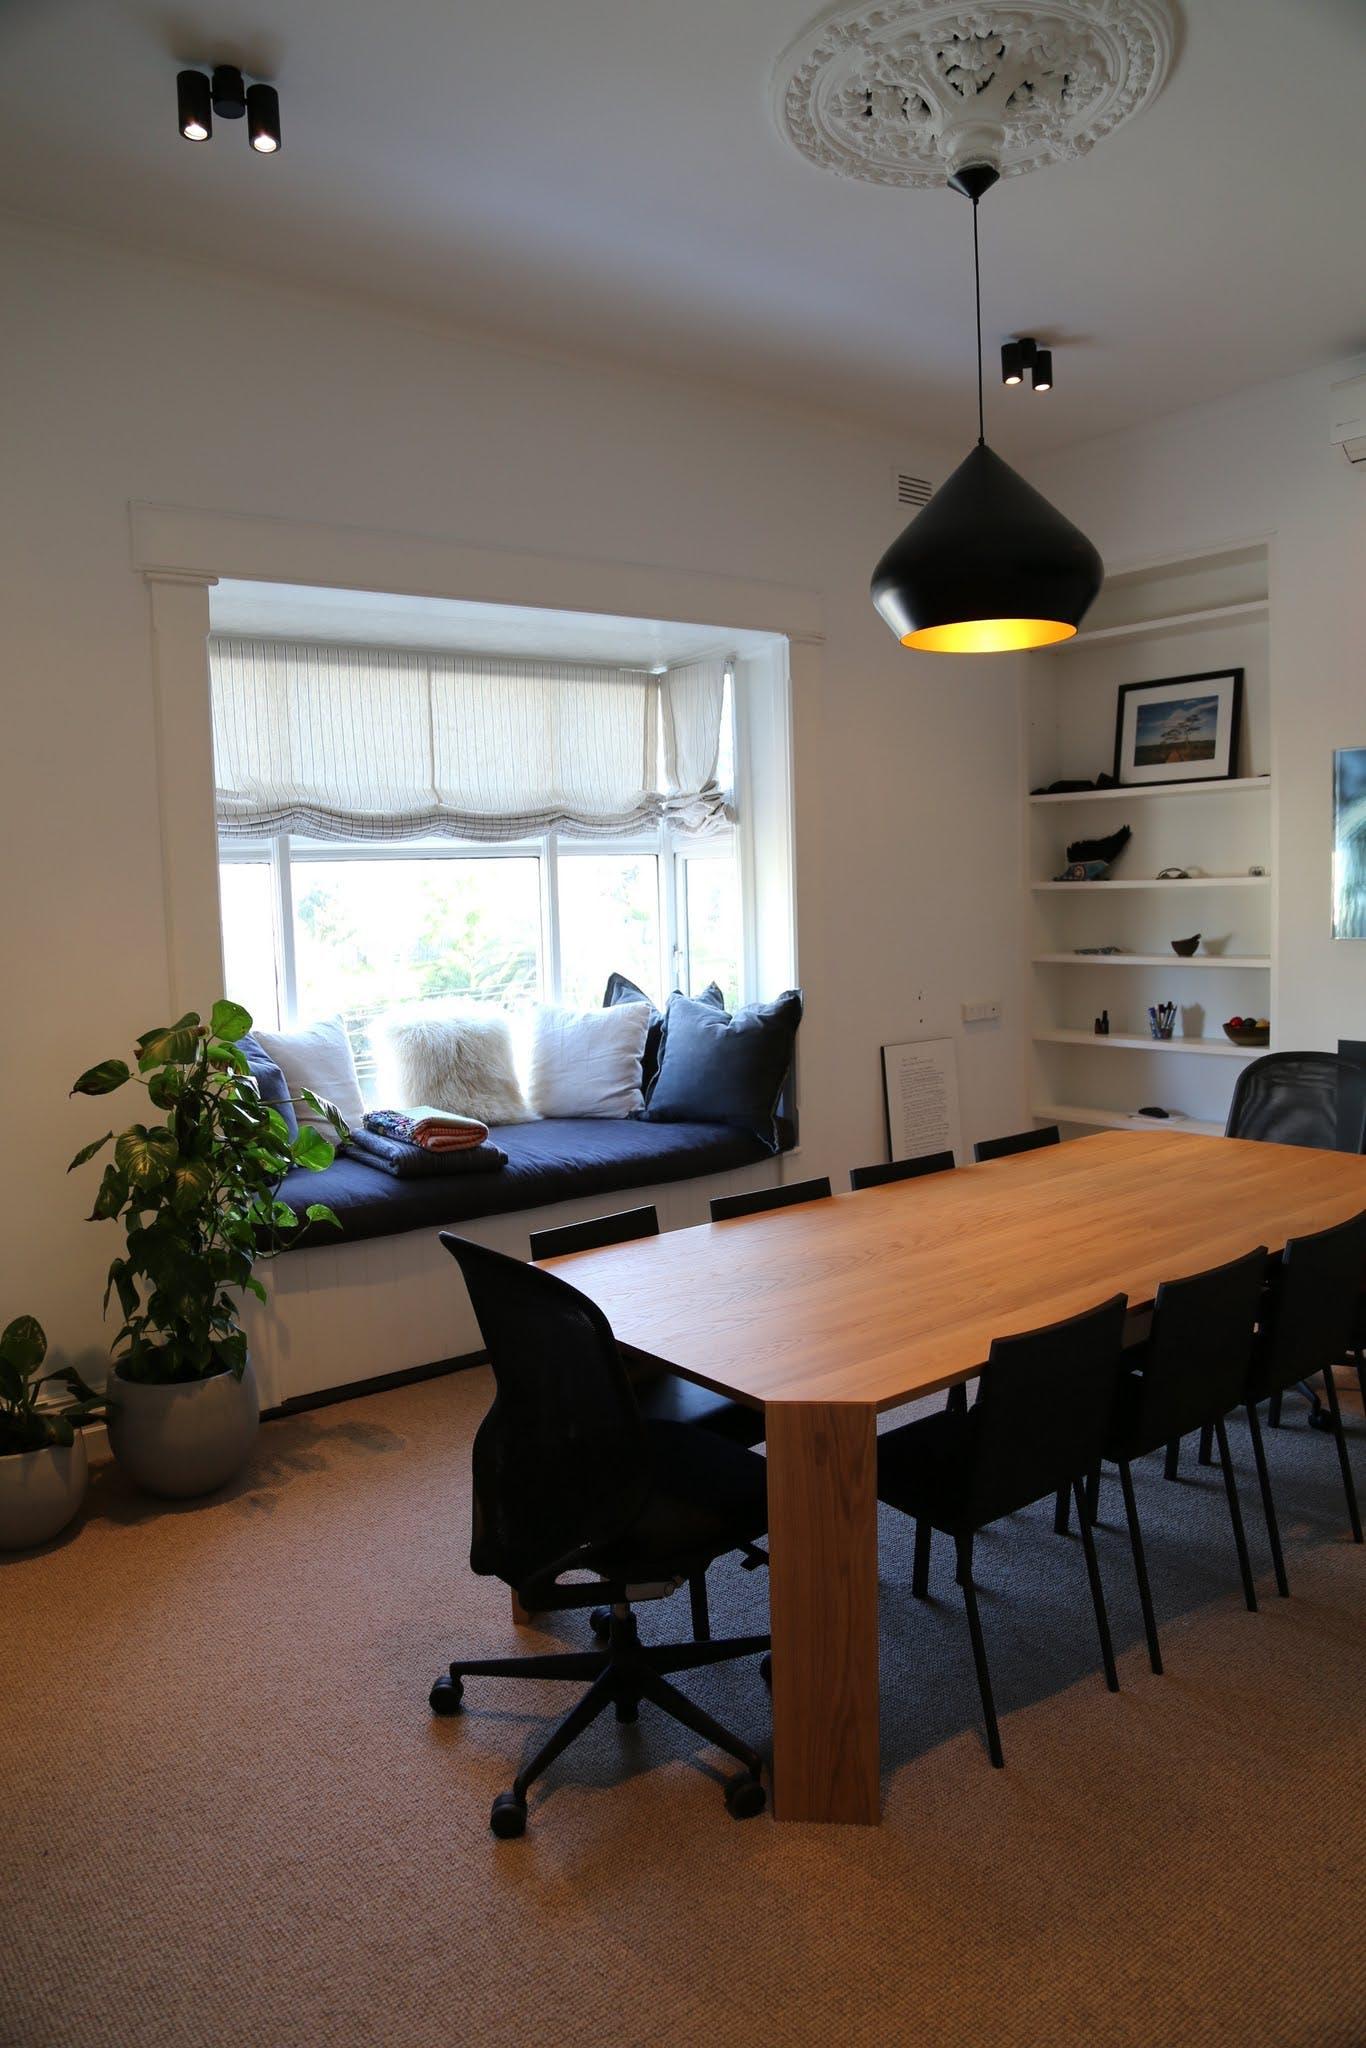 Boardroom, meeting room at The Beatt, image 1